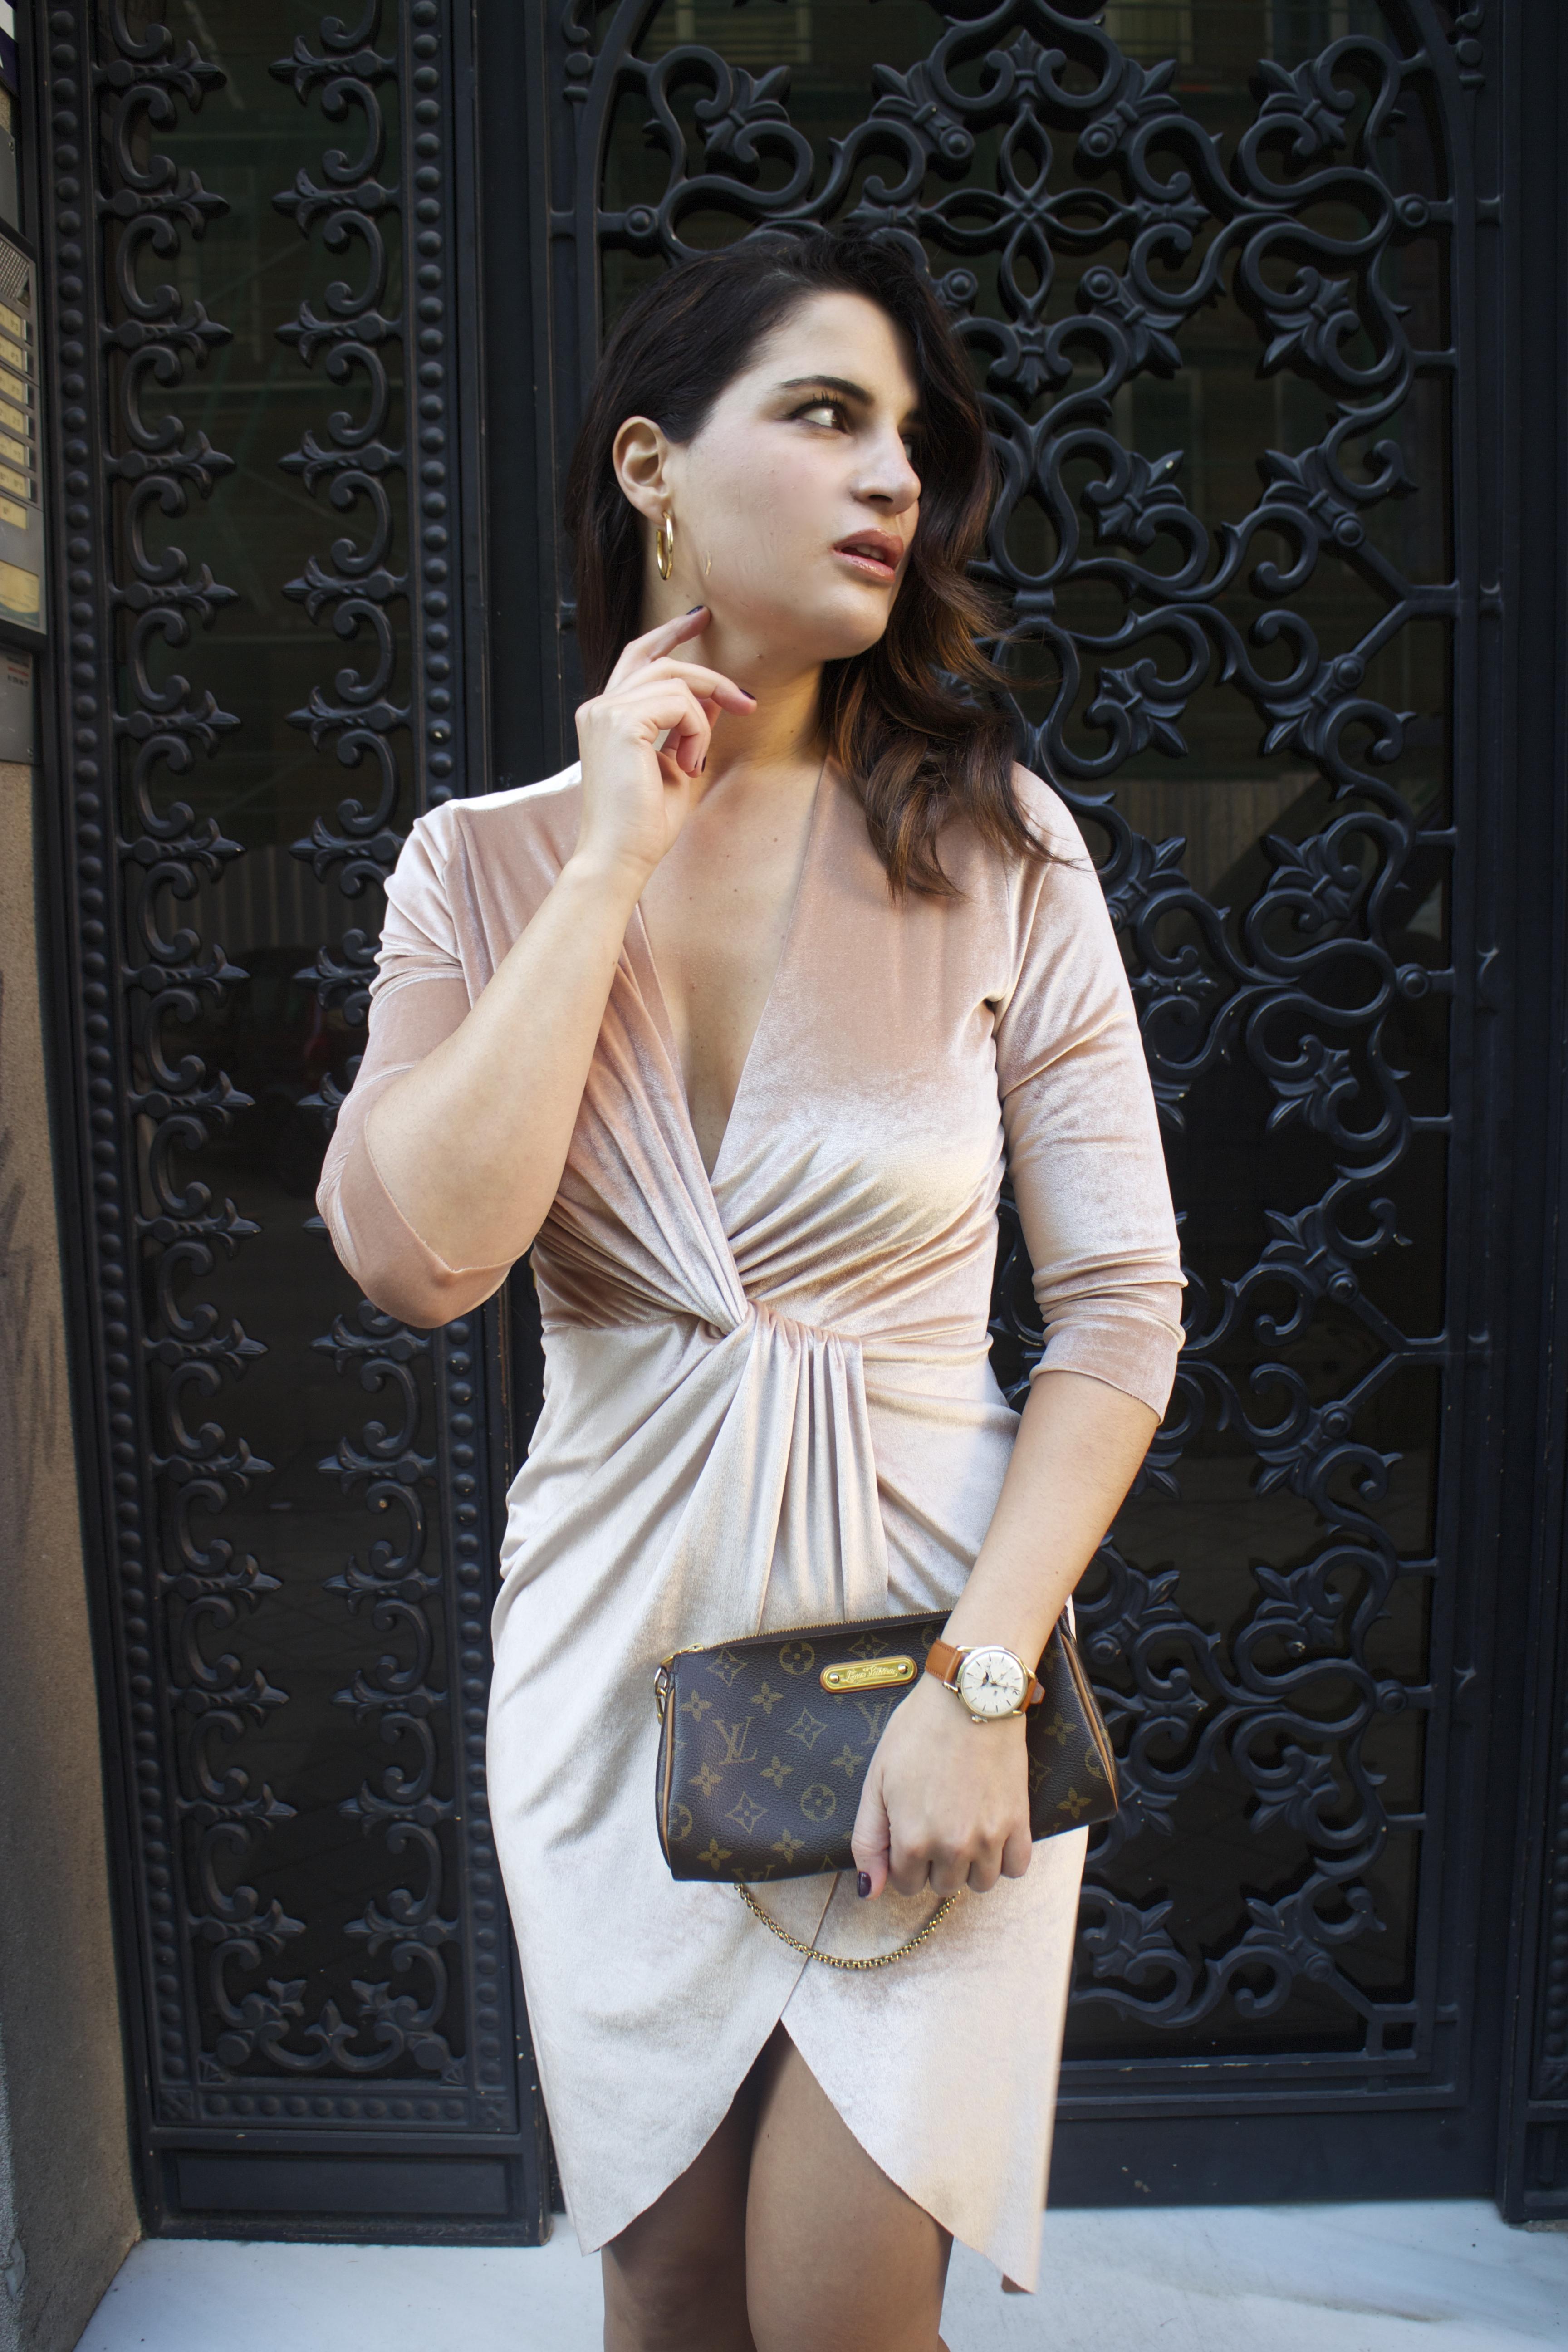 henry-london-watch-brand-embassador-pink-velvet-dress-vuitton-bag-lady-amaras-la-moda-paula-fraile14